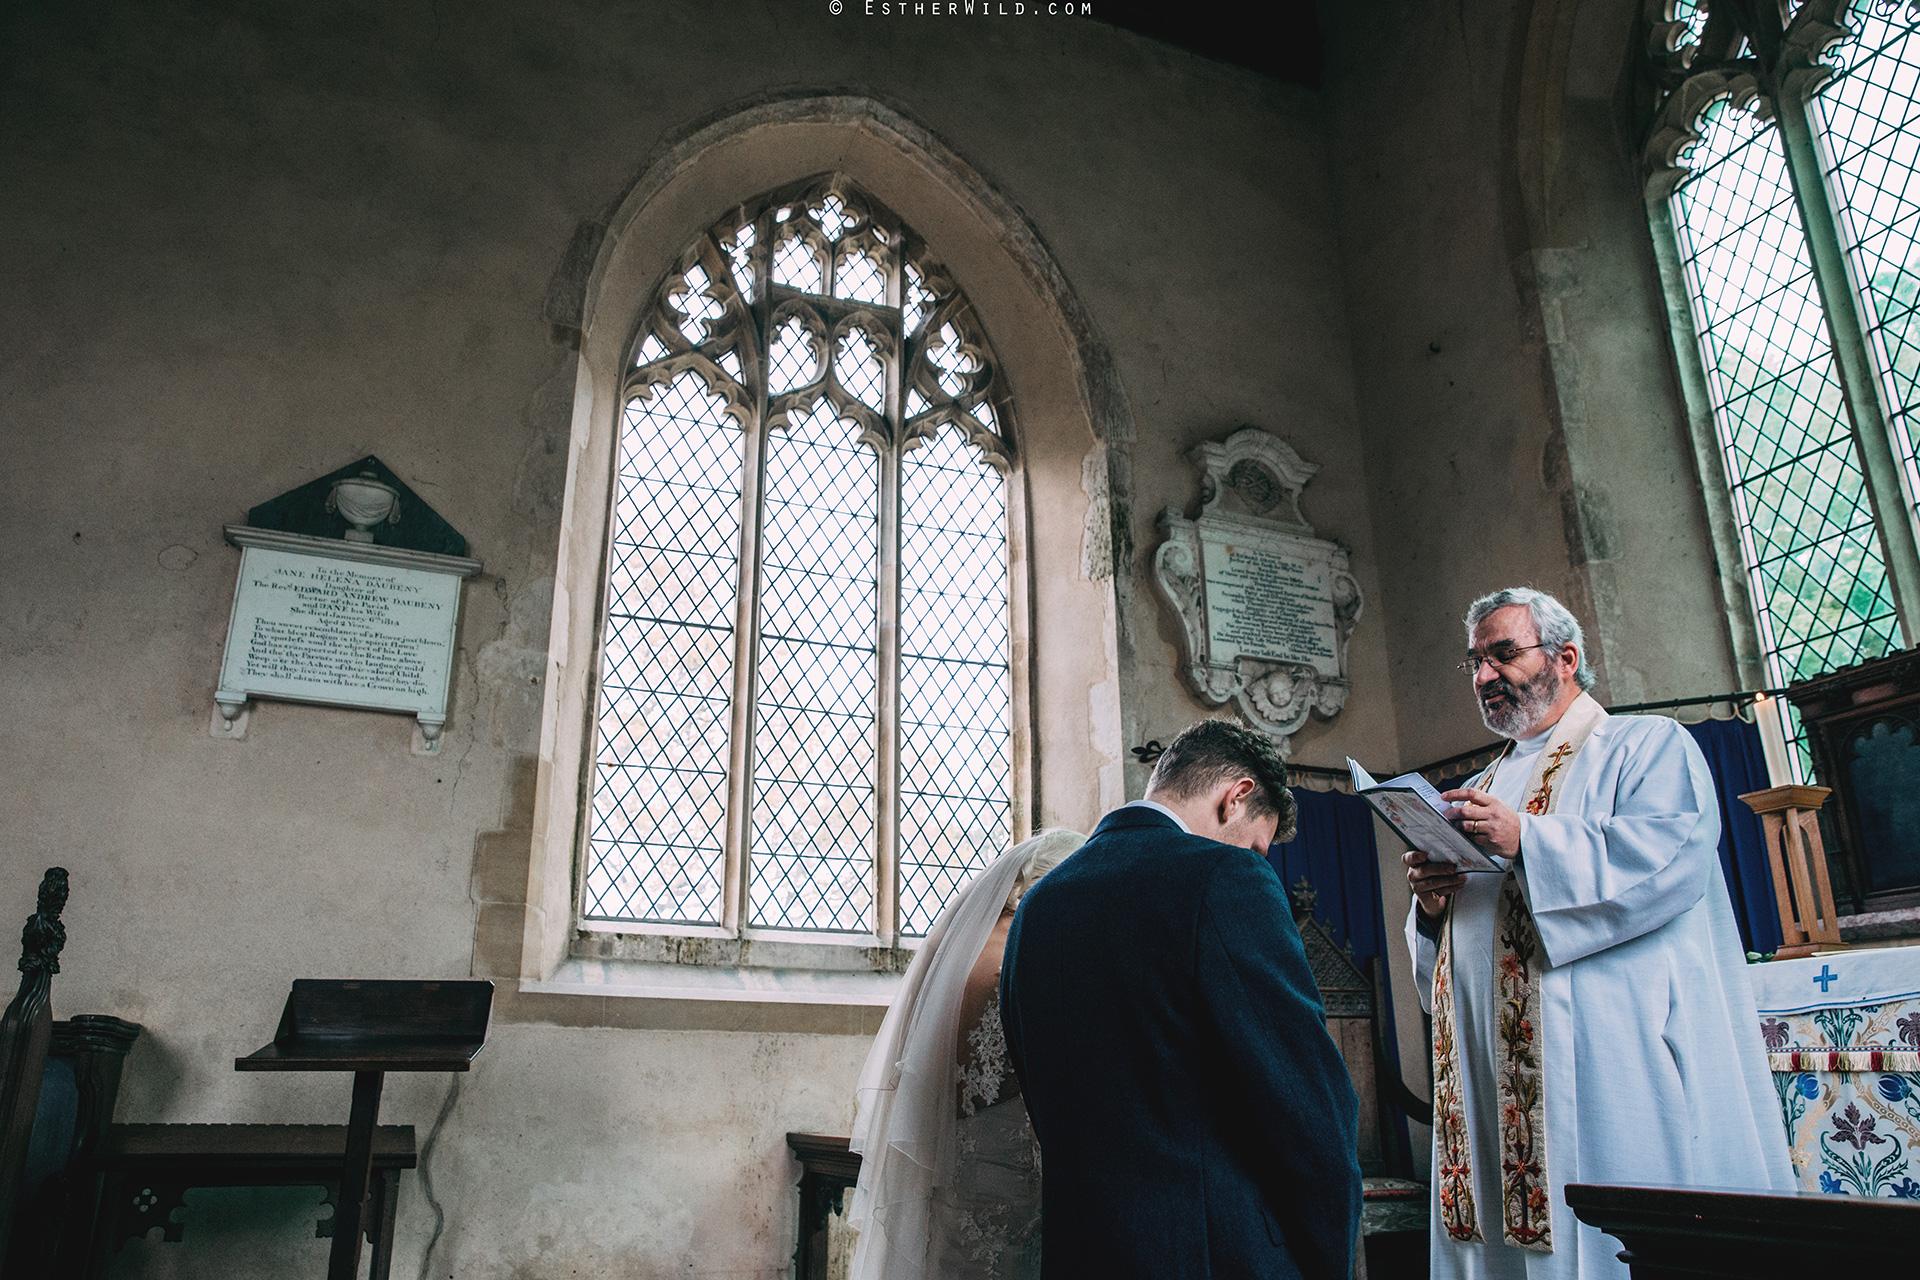 Wedding_Photographer_Norfolk_photography_Esther_Wild (105).jpg